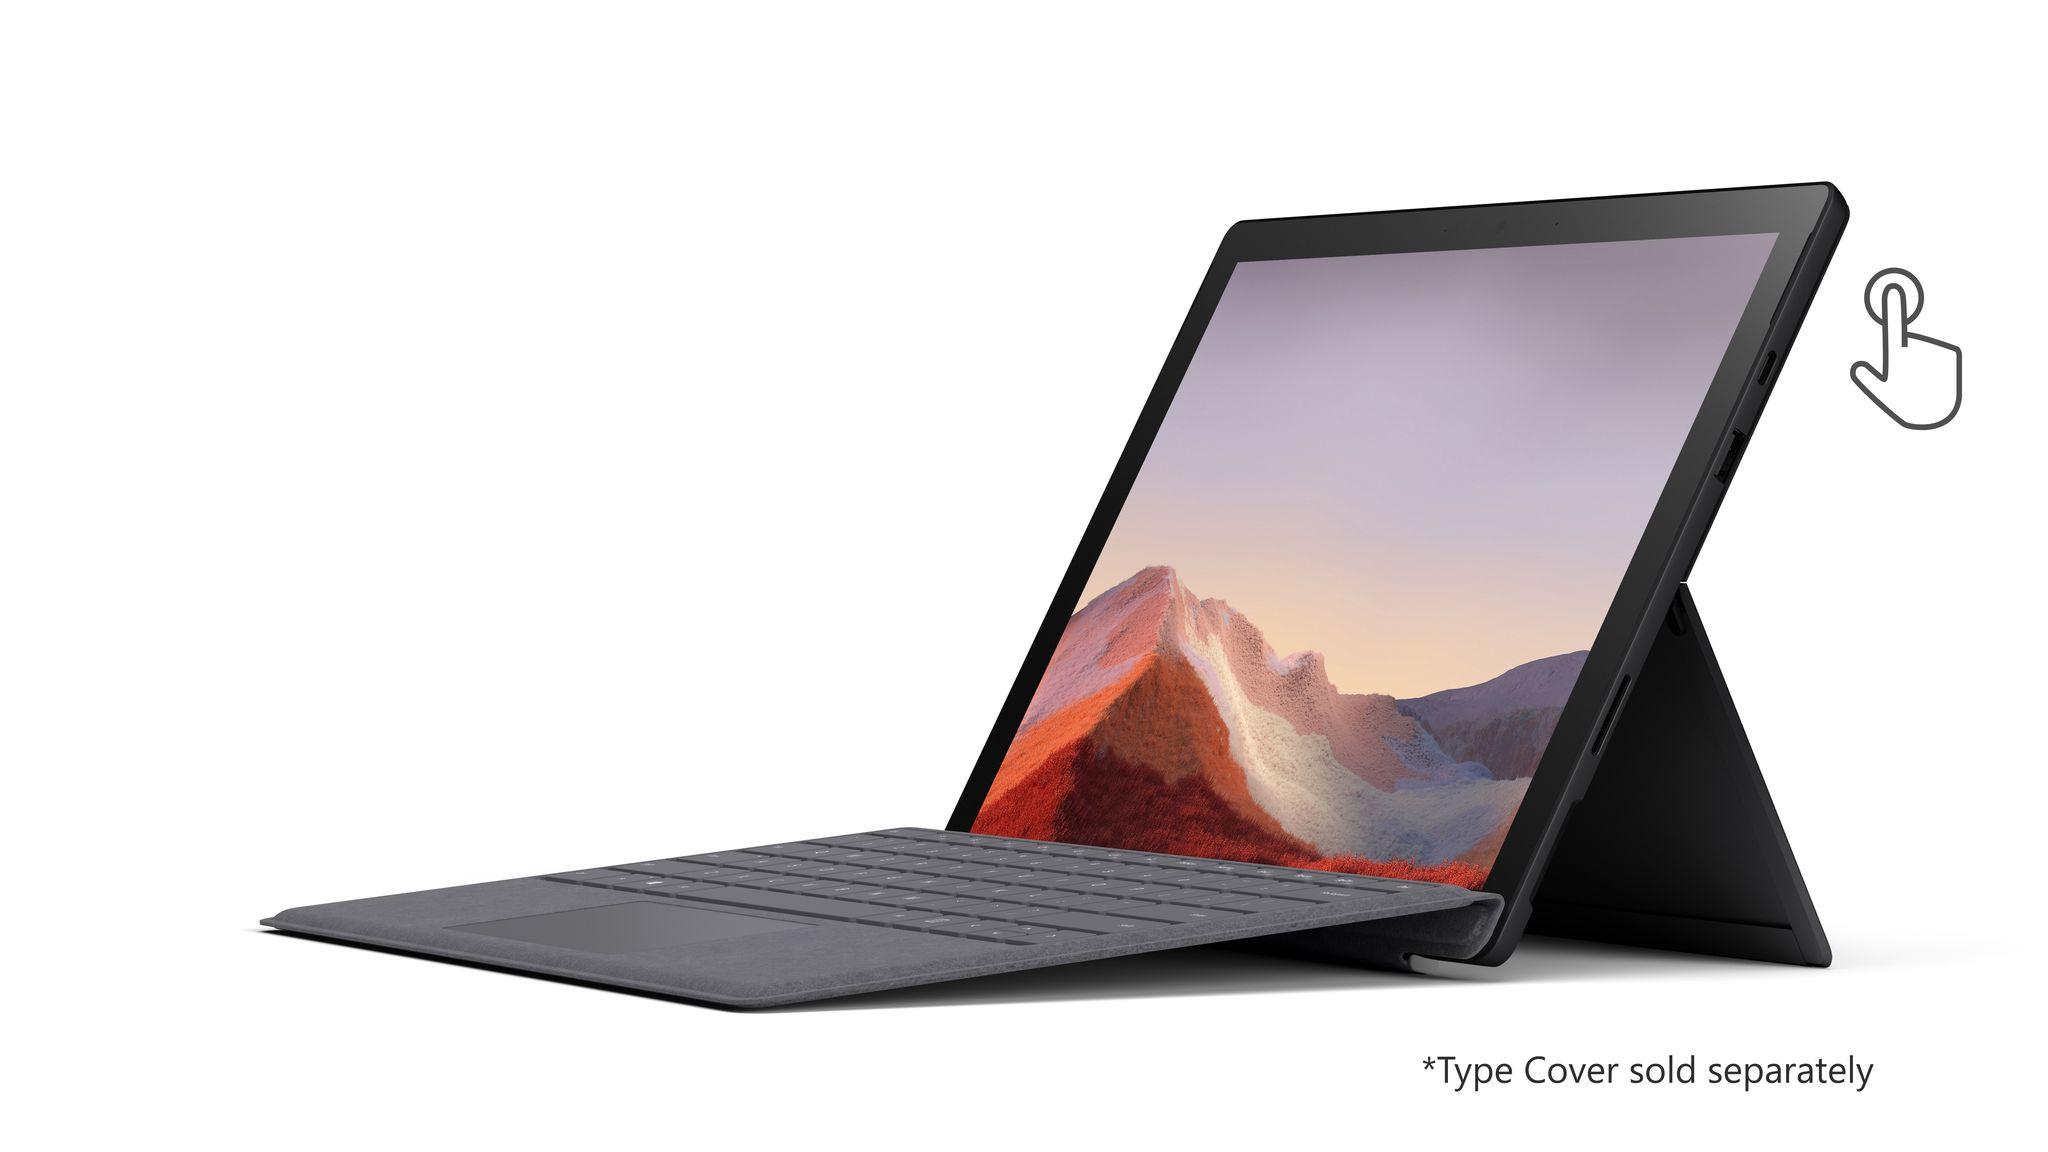 Walmart: Microsoft Surface Pro 7, 12.3″ Touch-Screen @ 49.99 + Free Shipping